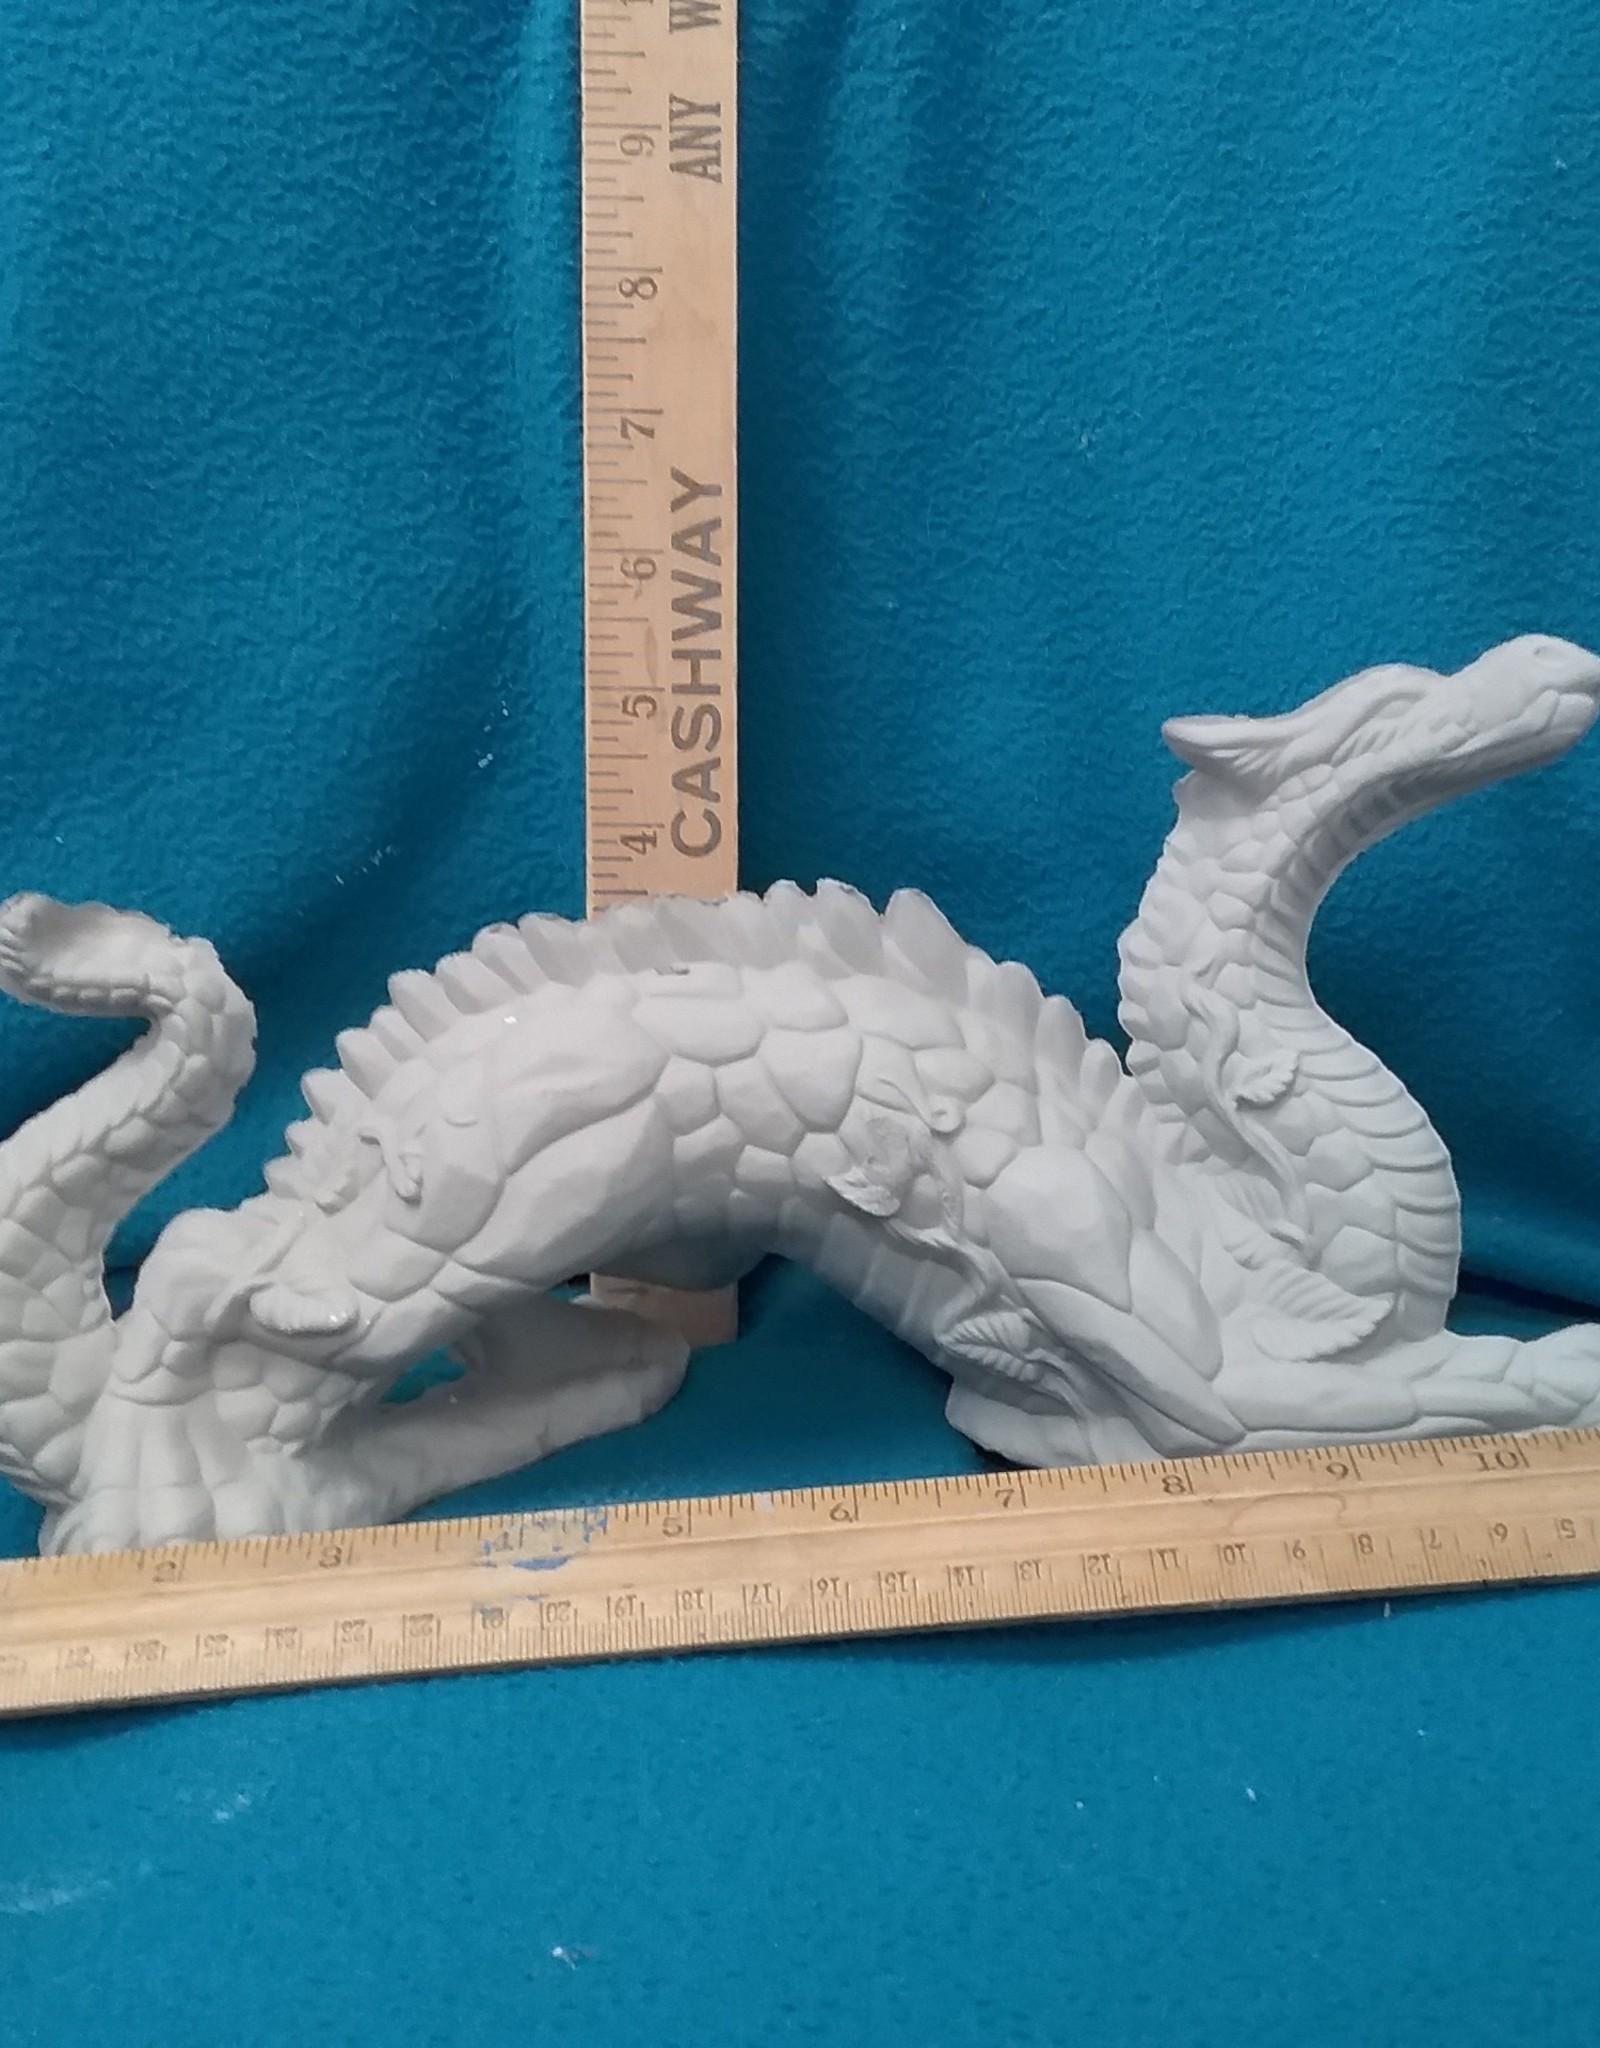 ART KIT Ceramic Dragon Serpentine #2 Art Kit